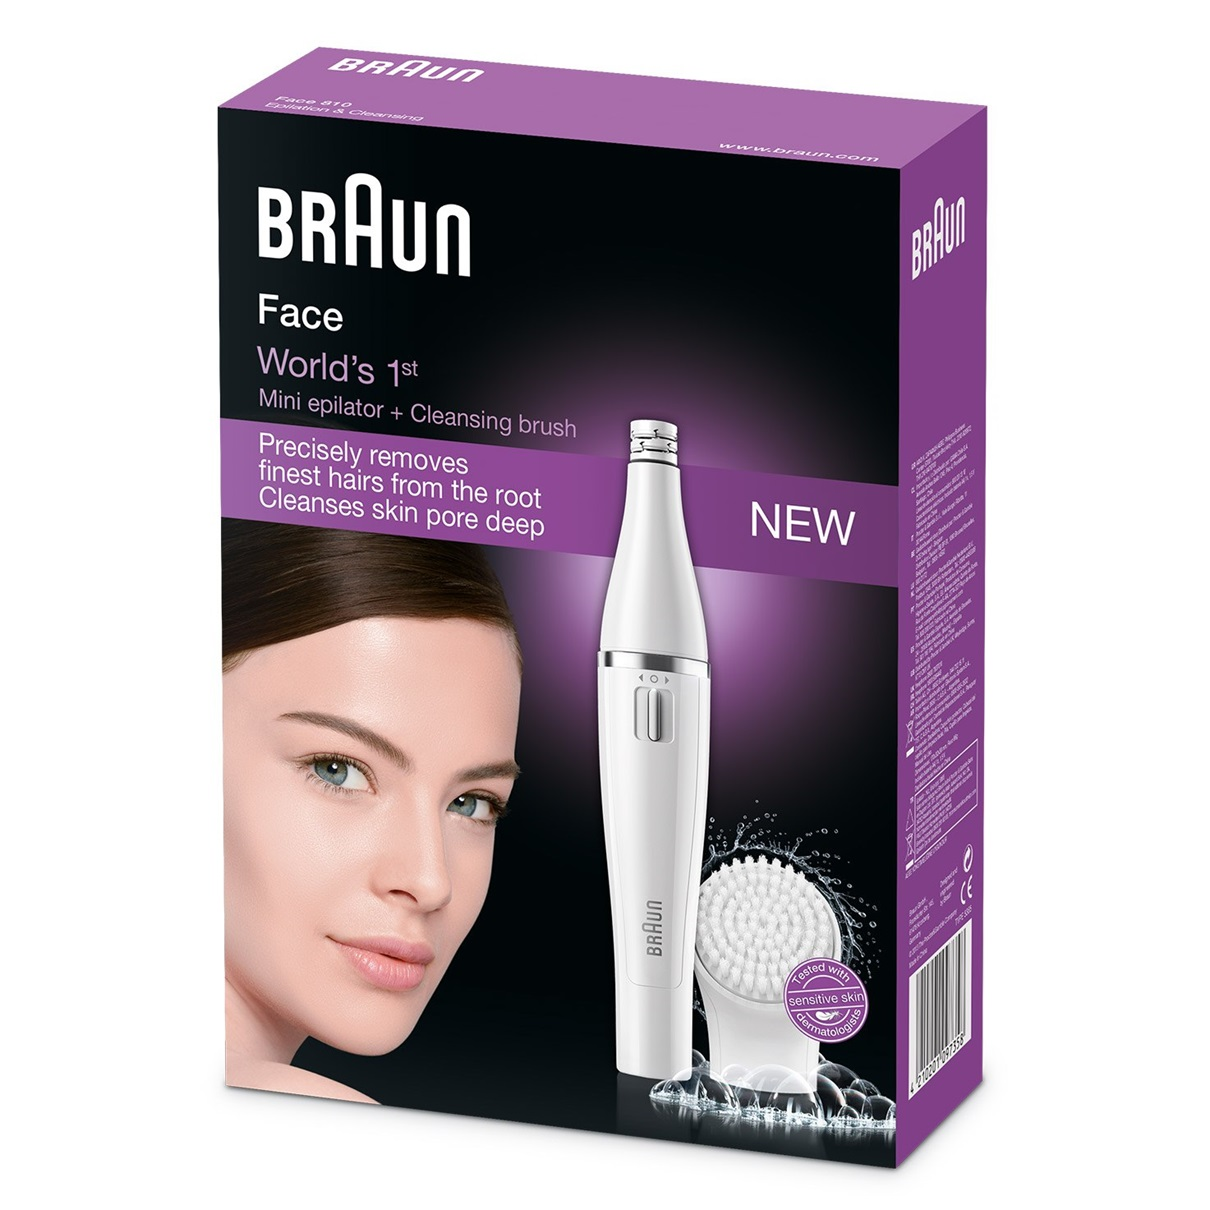 braun-face-810-yuz-epilatoru__1147832885852528 (1)